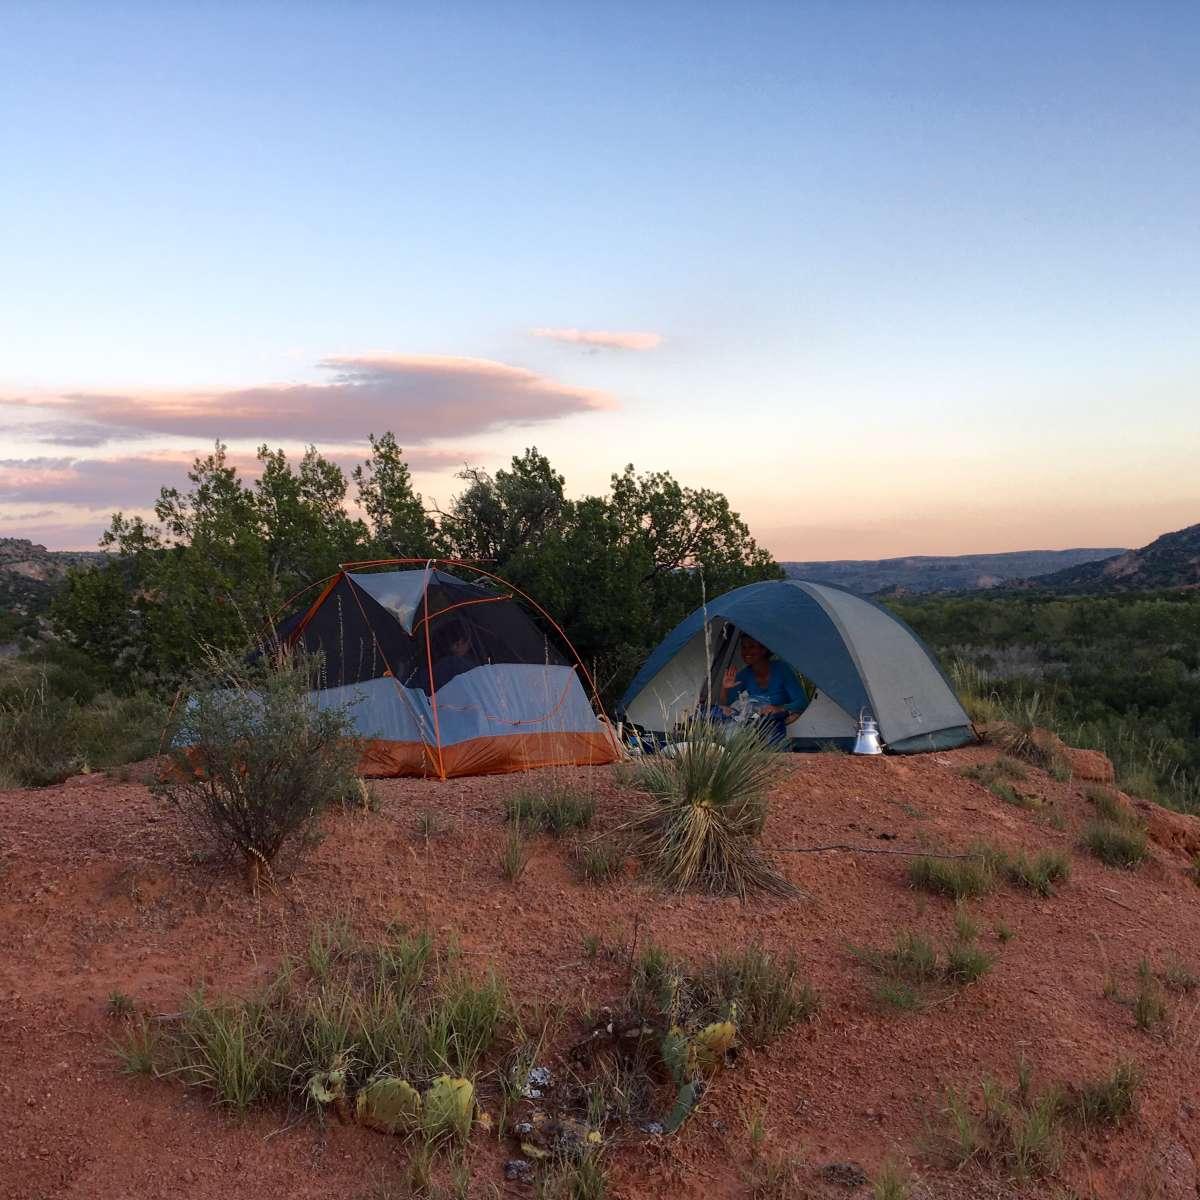 Equestrian Campsites, Palo Duro, TX: 1 Hipcamper review ...